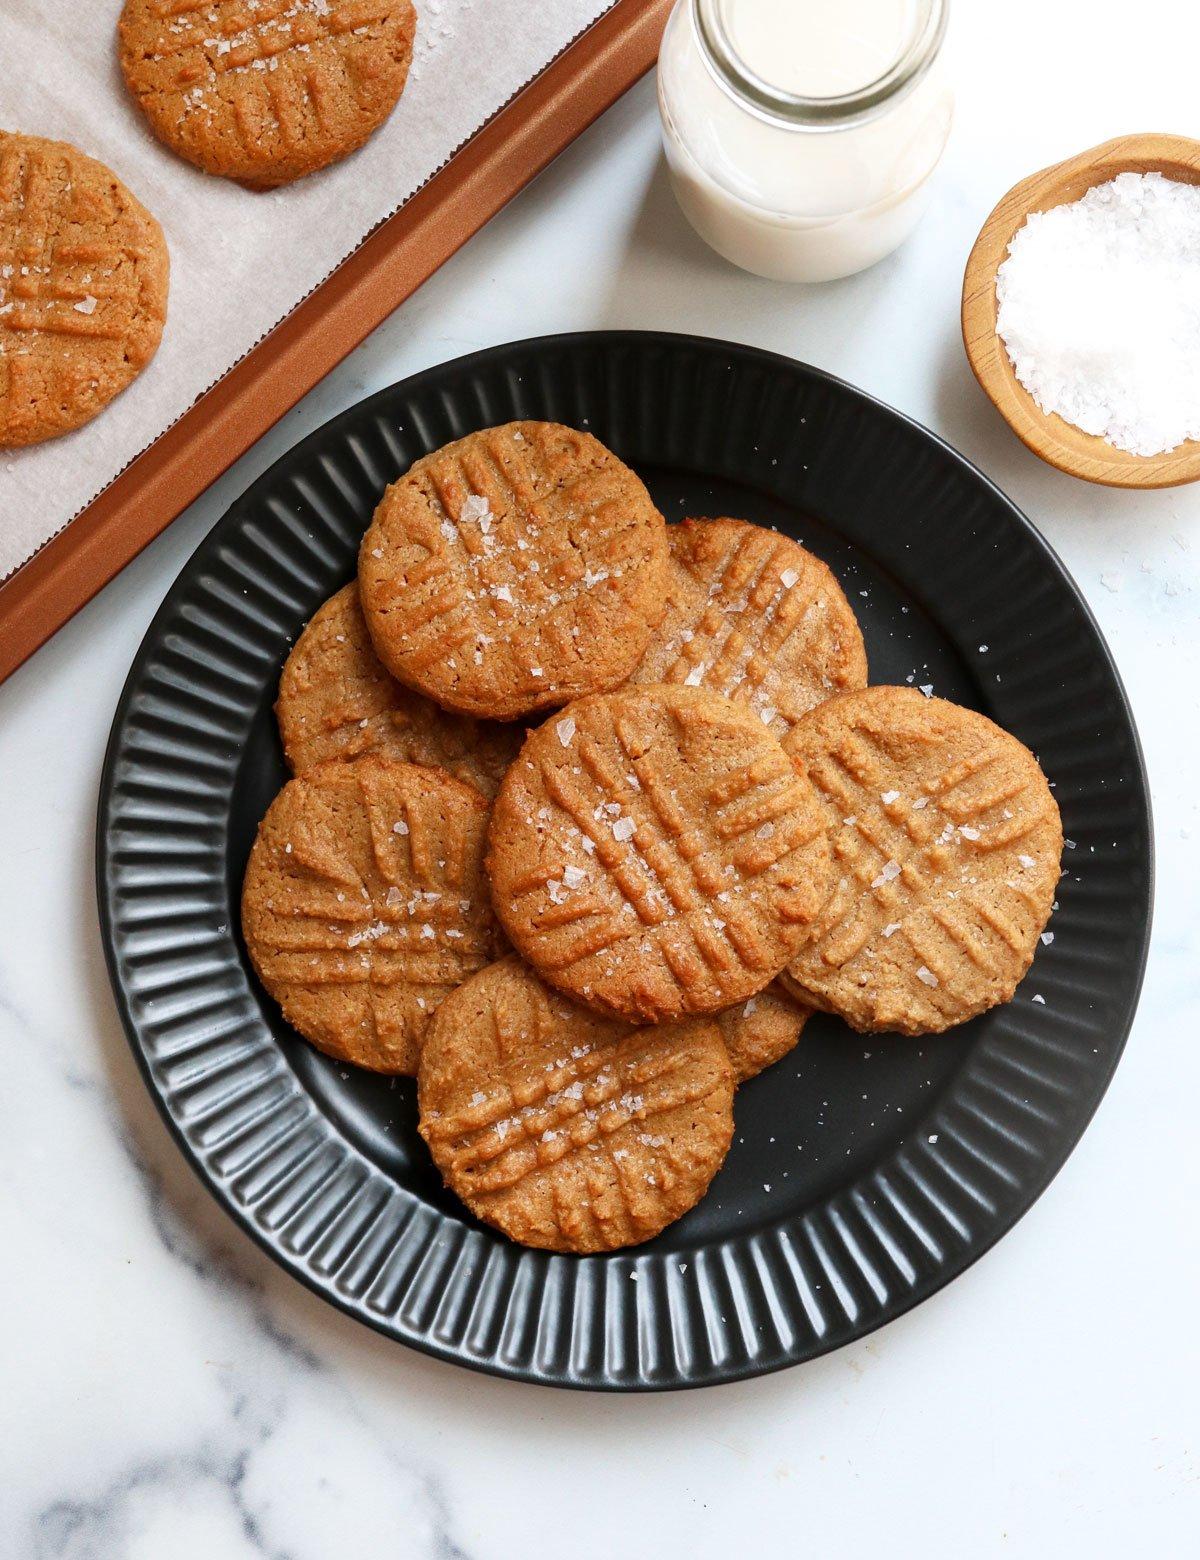 flourless peanut butter cookies on black plate